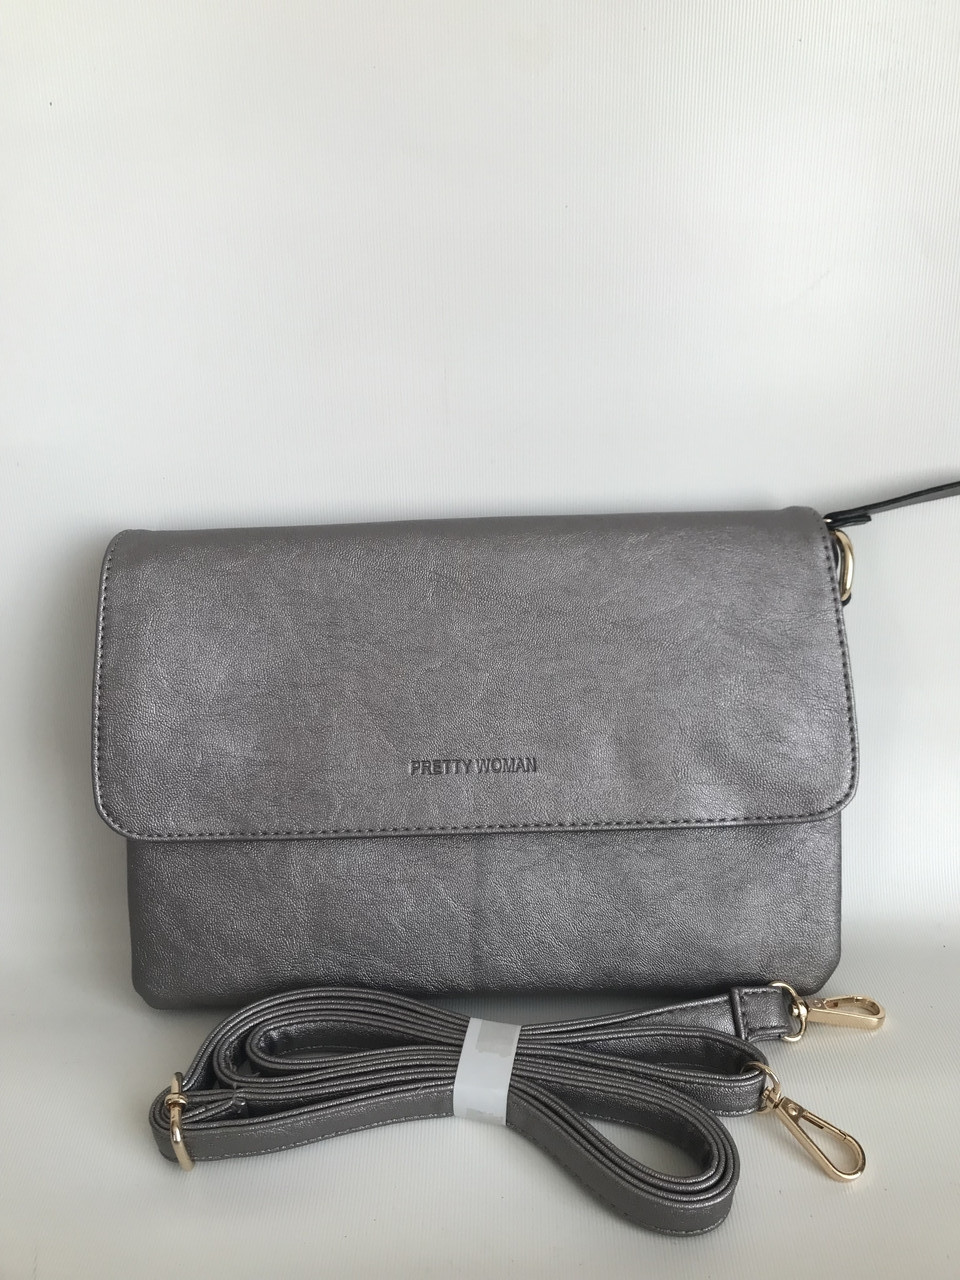 Женская сумочка клатч серебристого цвета через плечо кроссбоди Pretty Woman